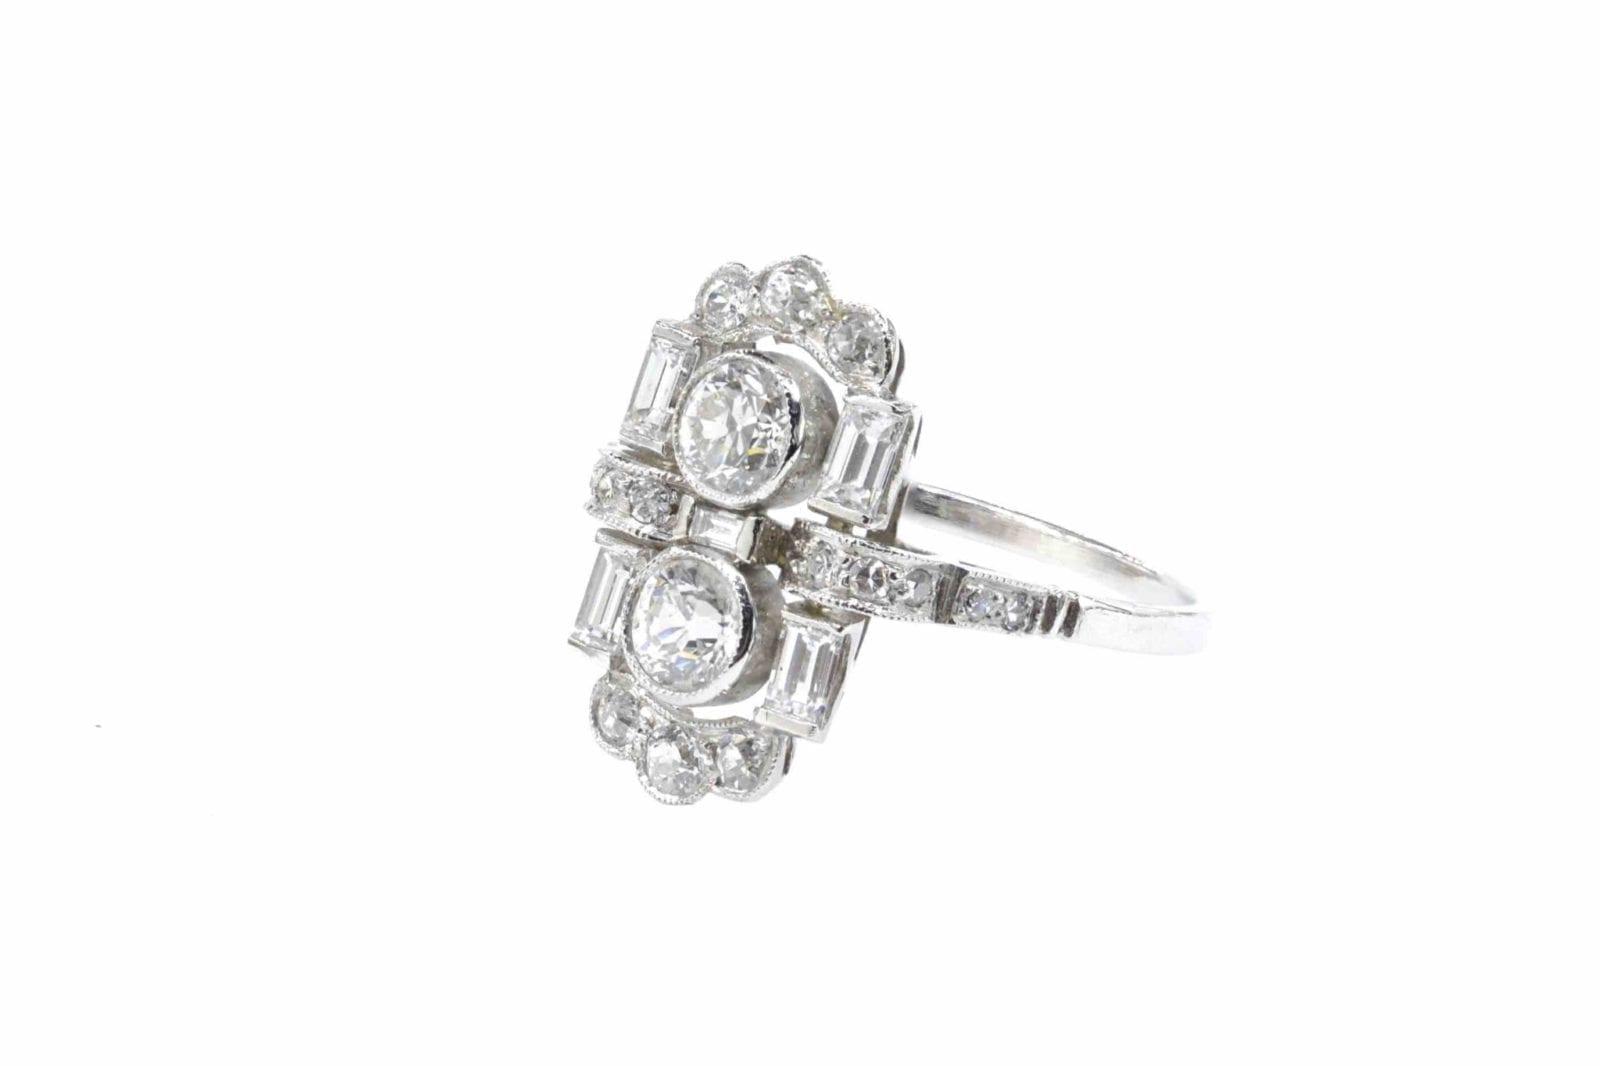 bague occasion platine diamants